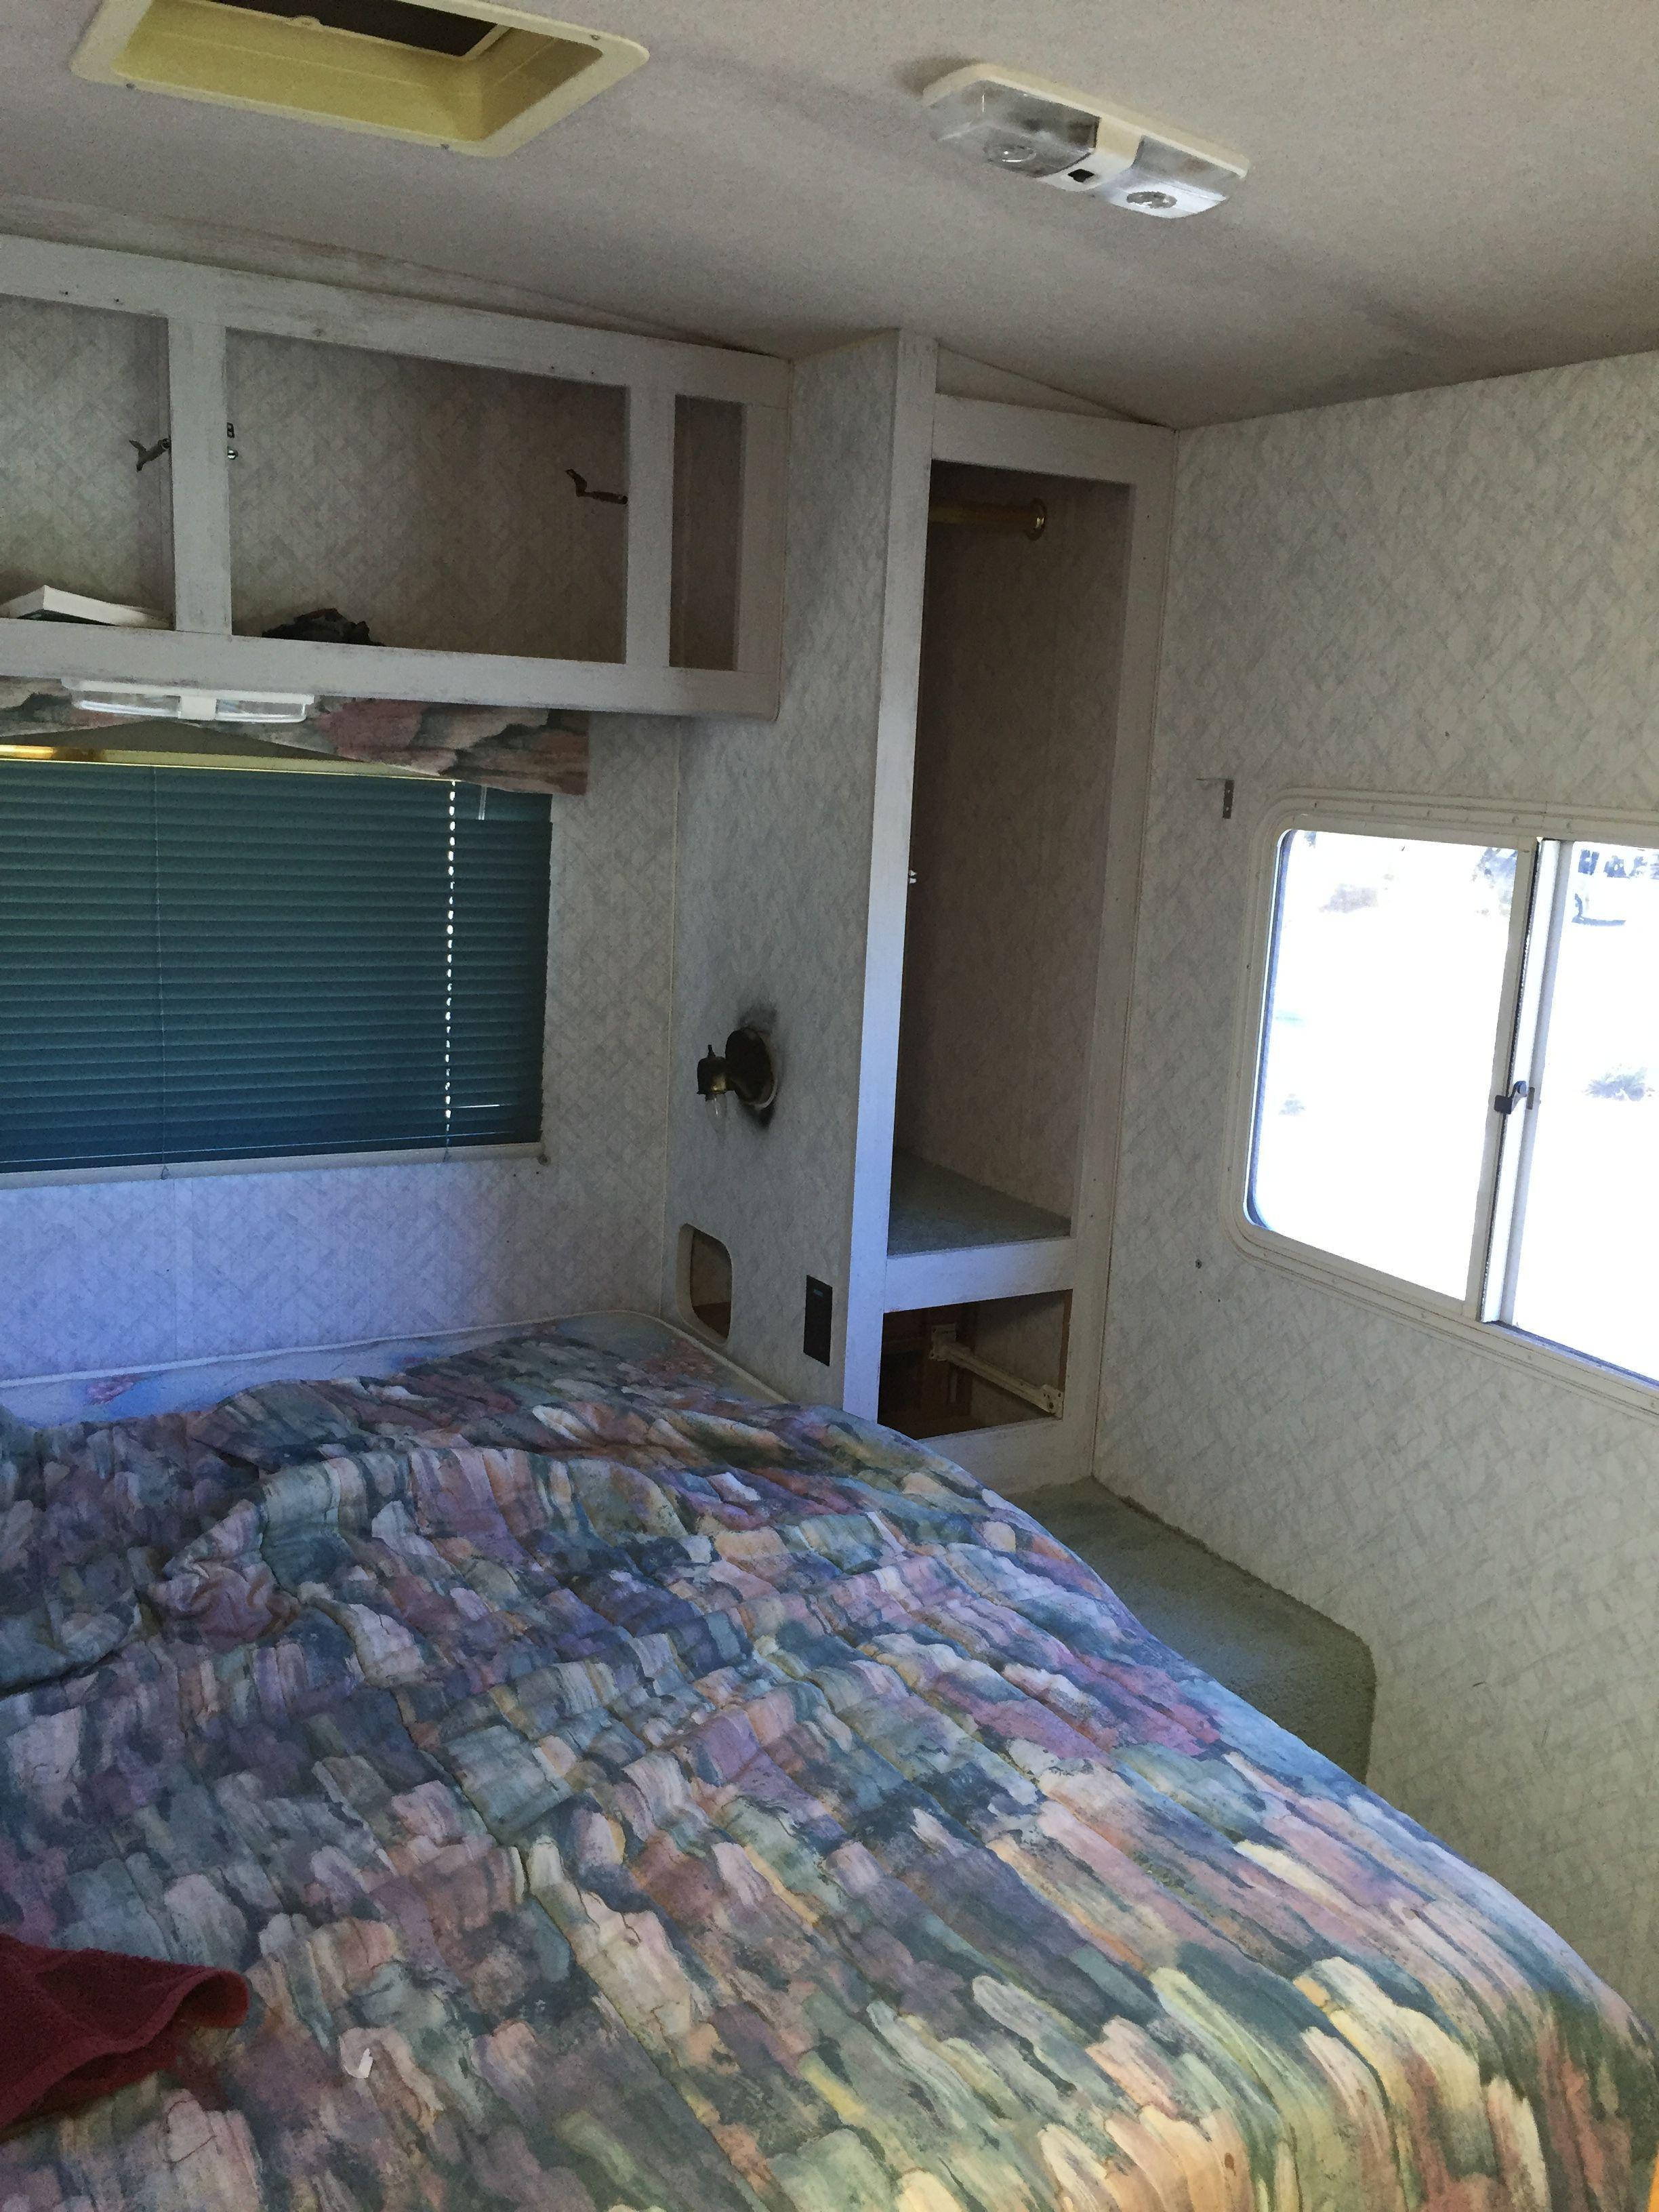 Bedroom during renovation